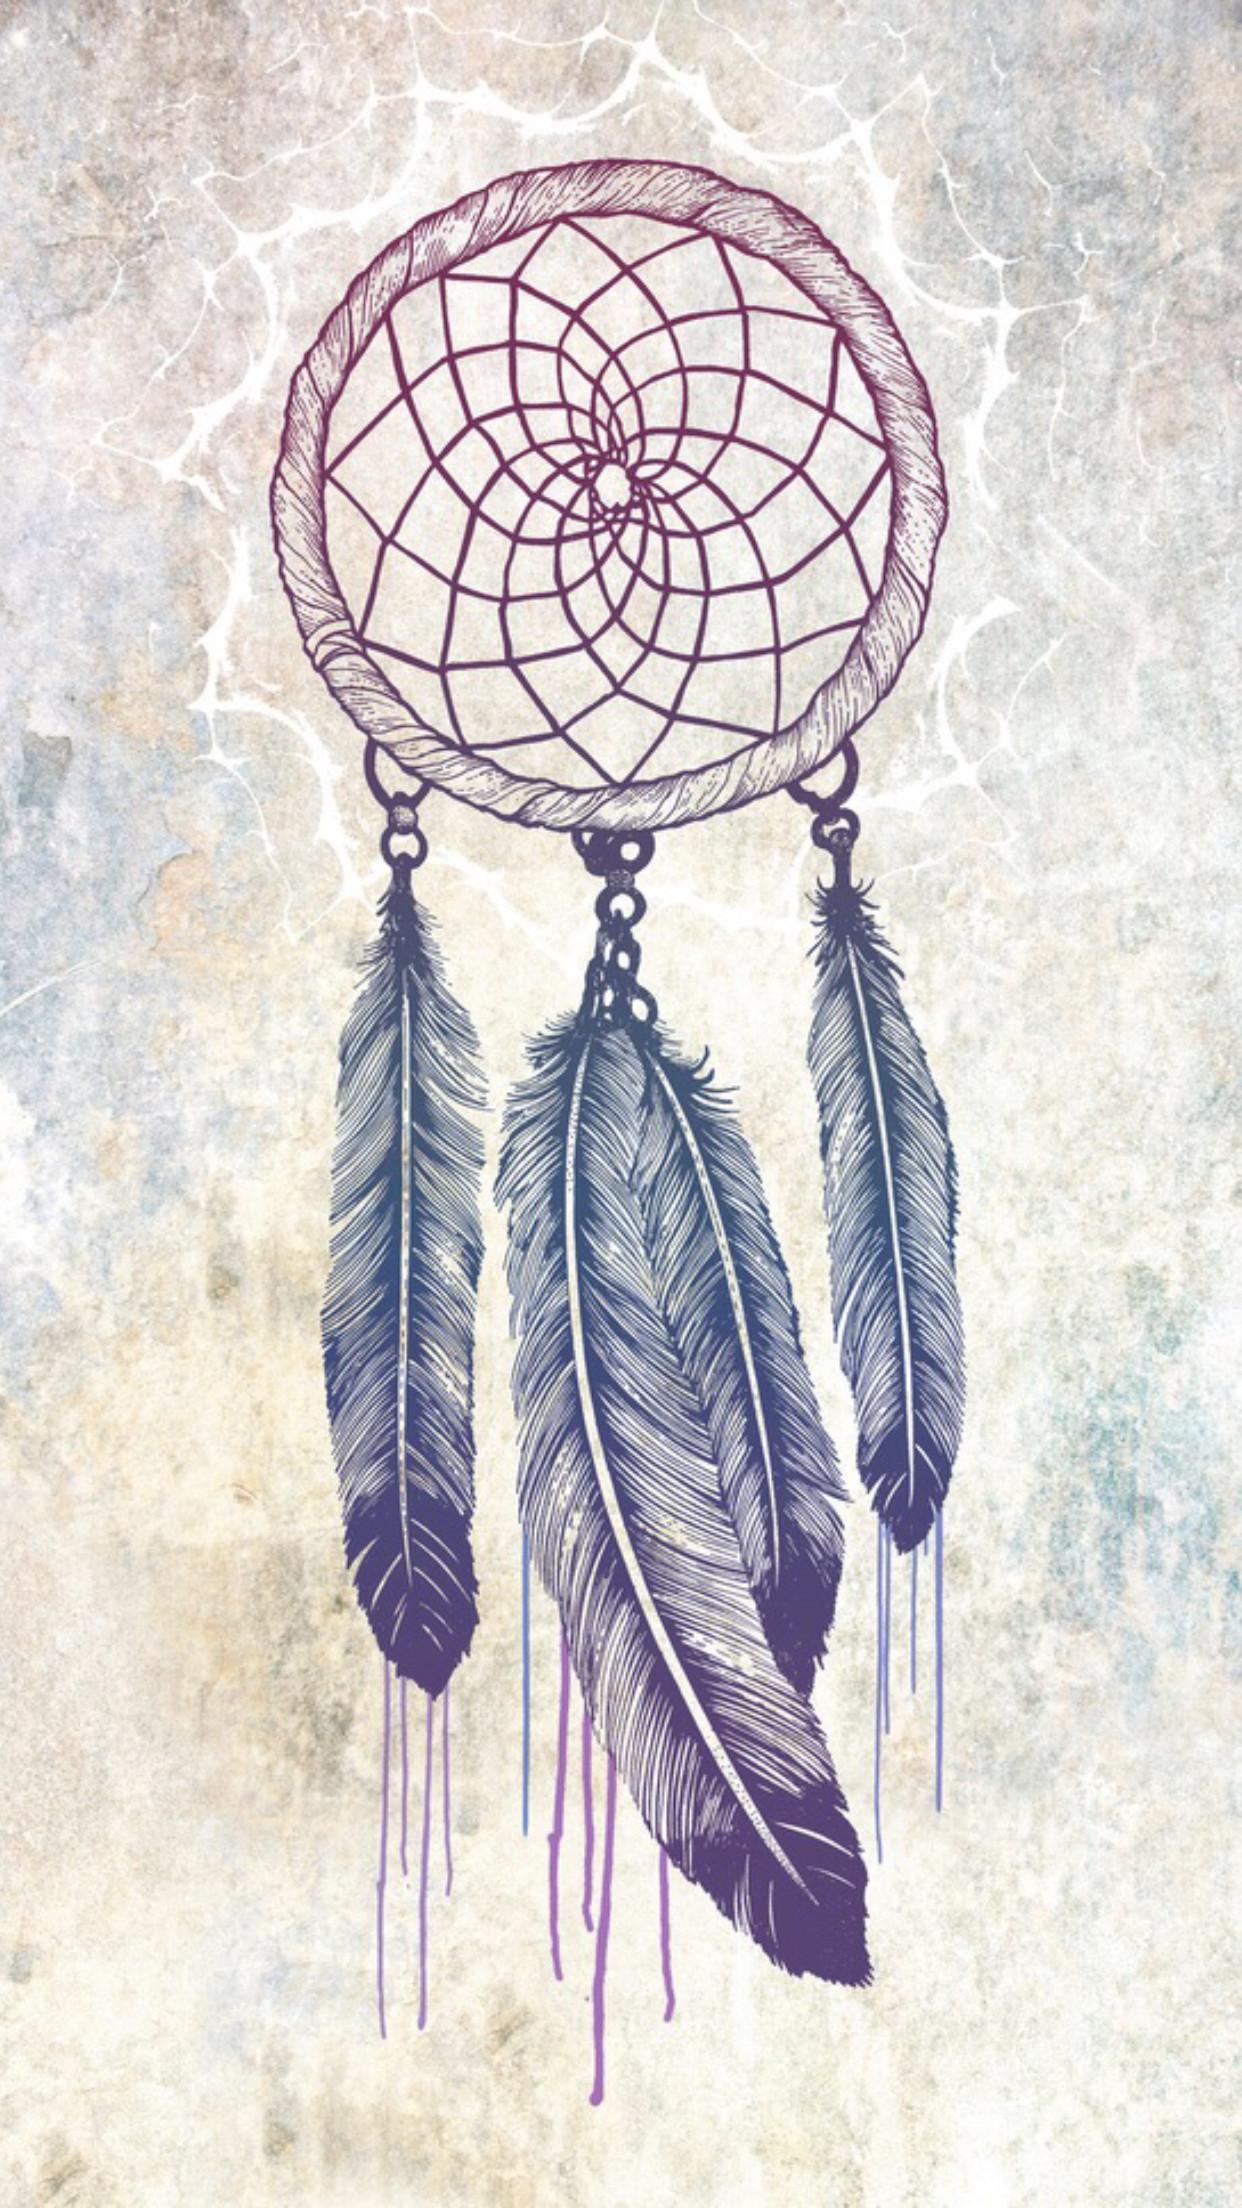 Dreamcatcher Wallpaper Tumblr (57+ images)